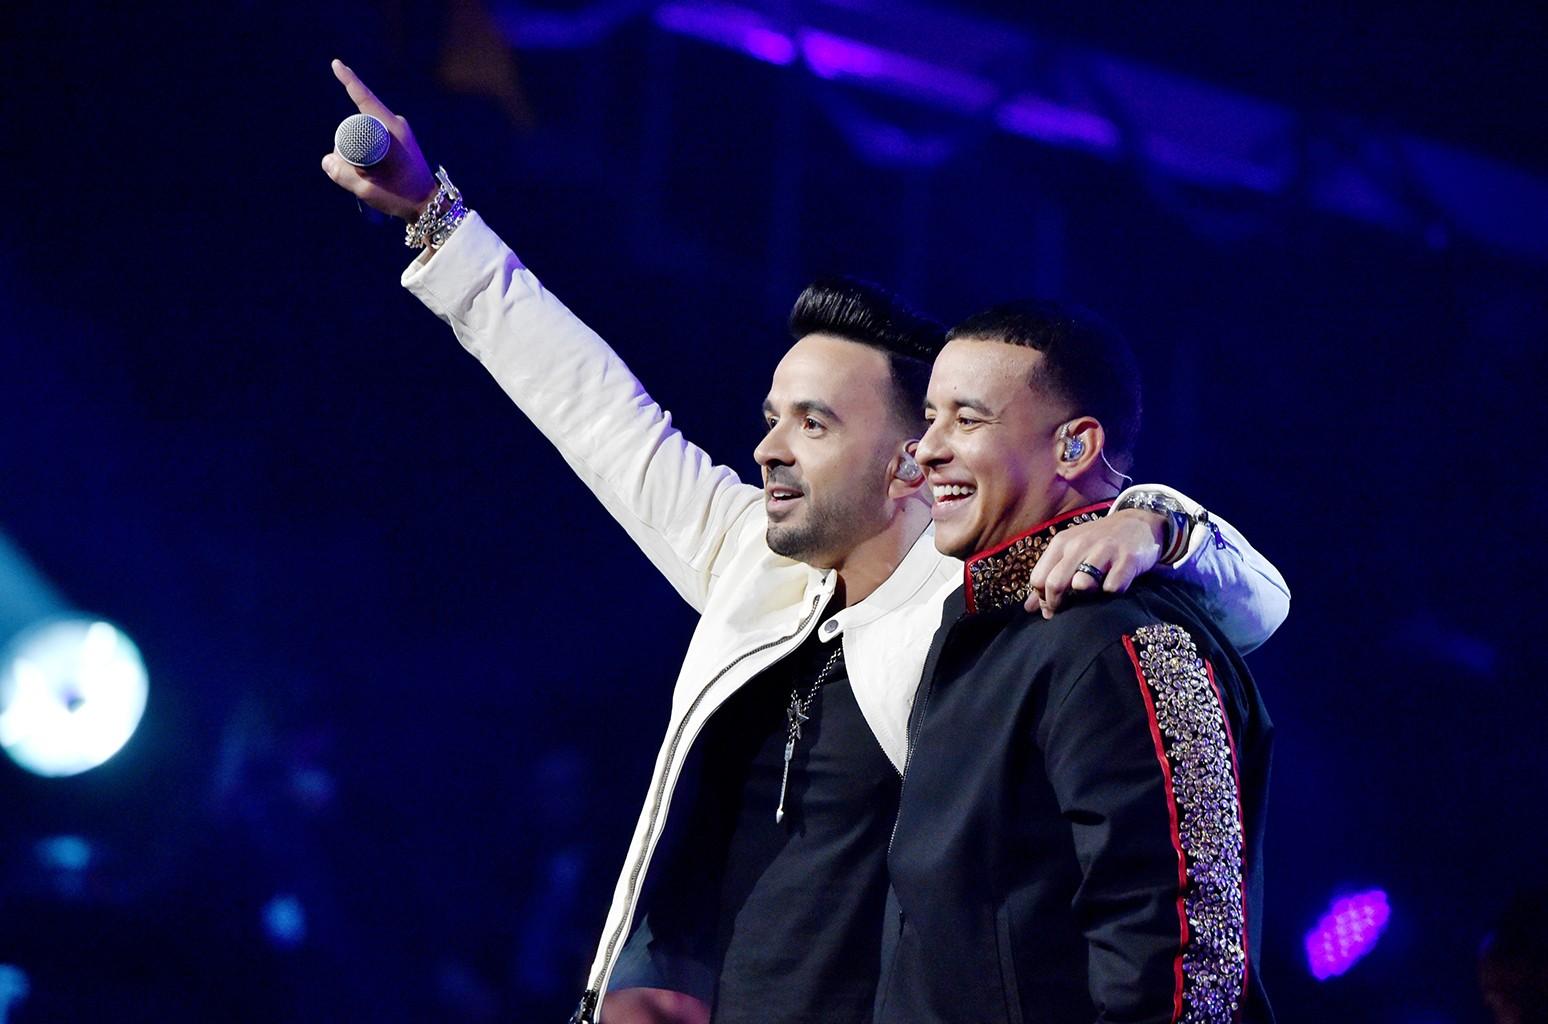 Luis Fonsi & Daddy Yankee, 2018